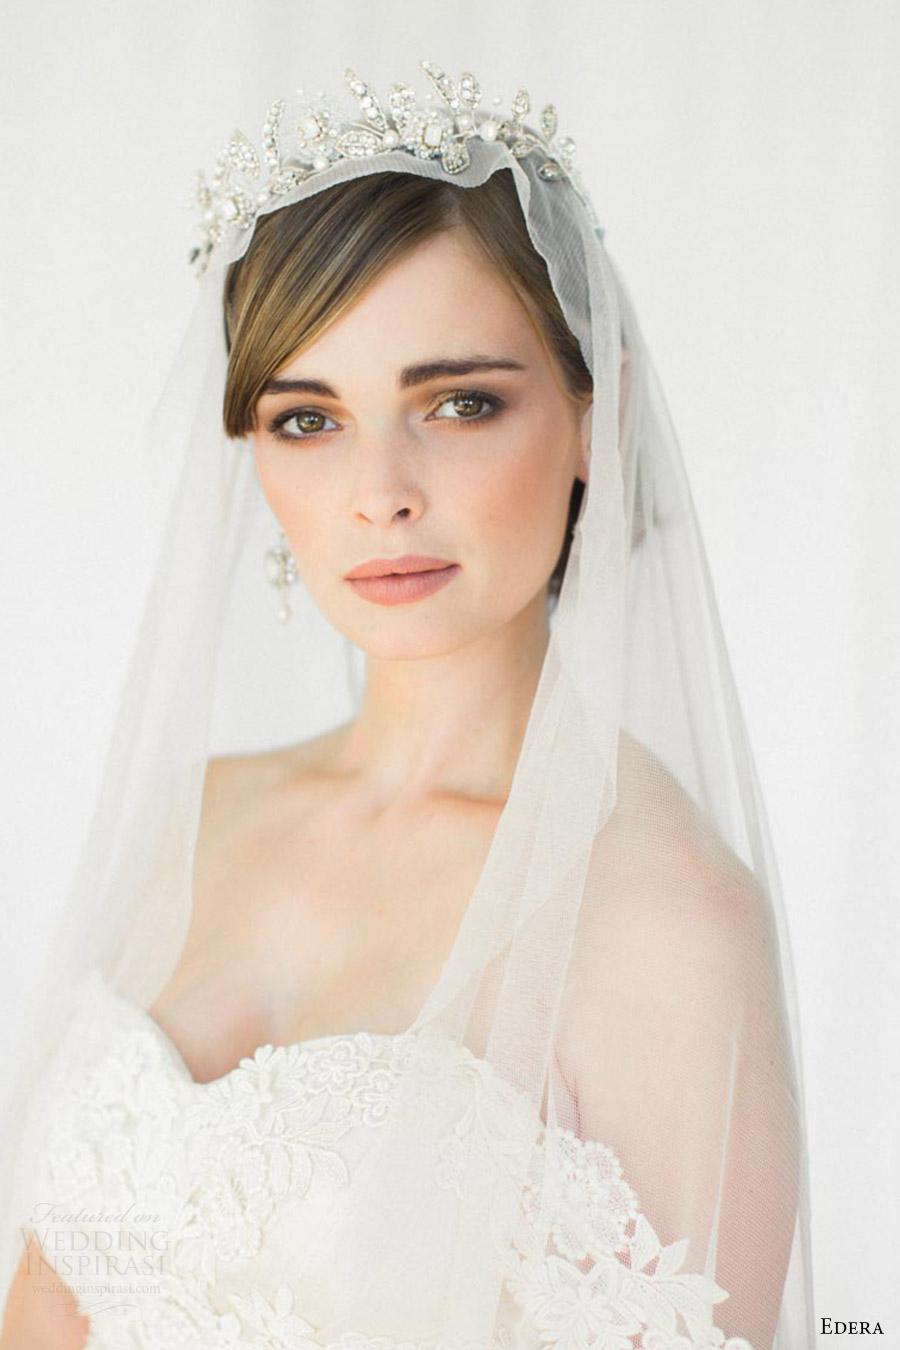 edera jewelry 2016 bridal accessories collection (aquarelle) tiara